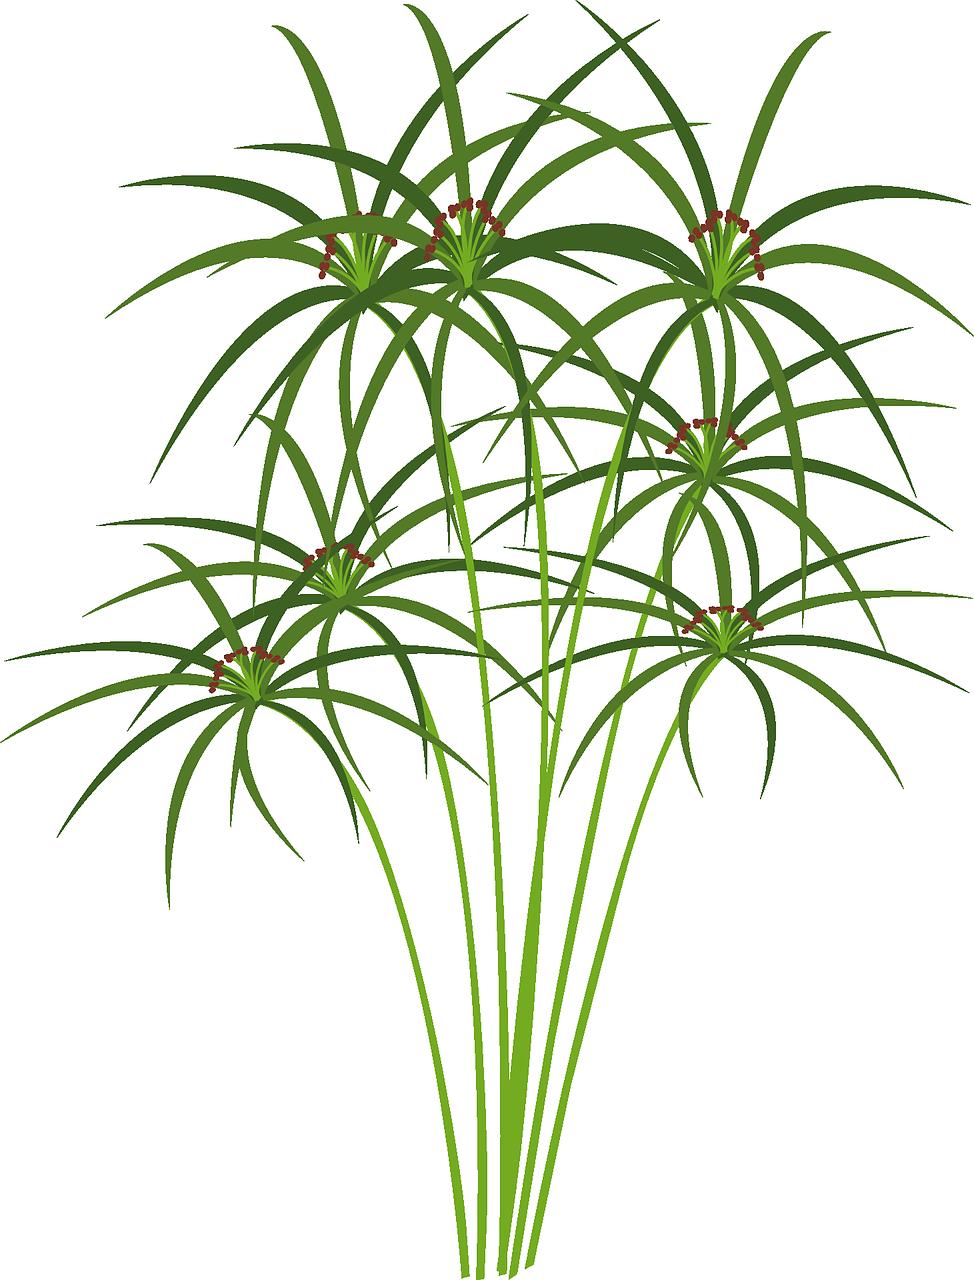 HD Papyrus Plant Hemp Png Image.